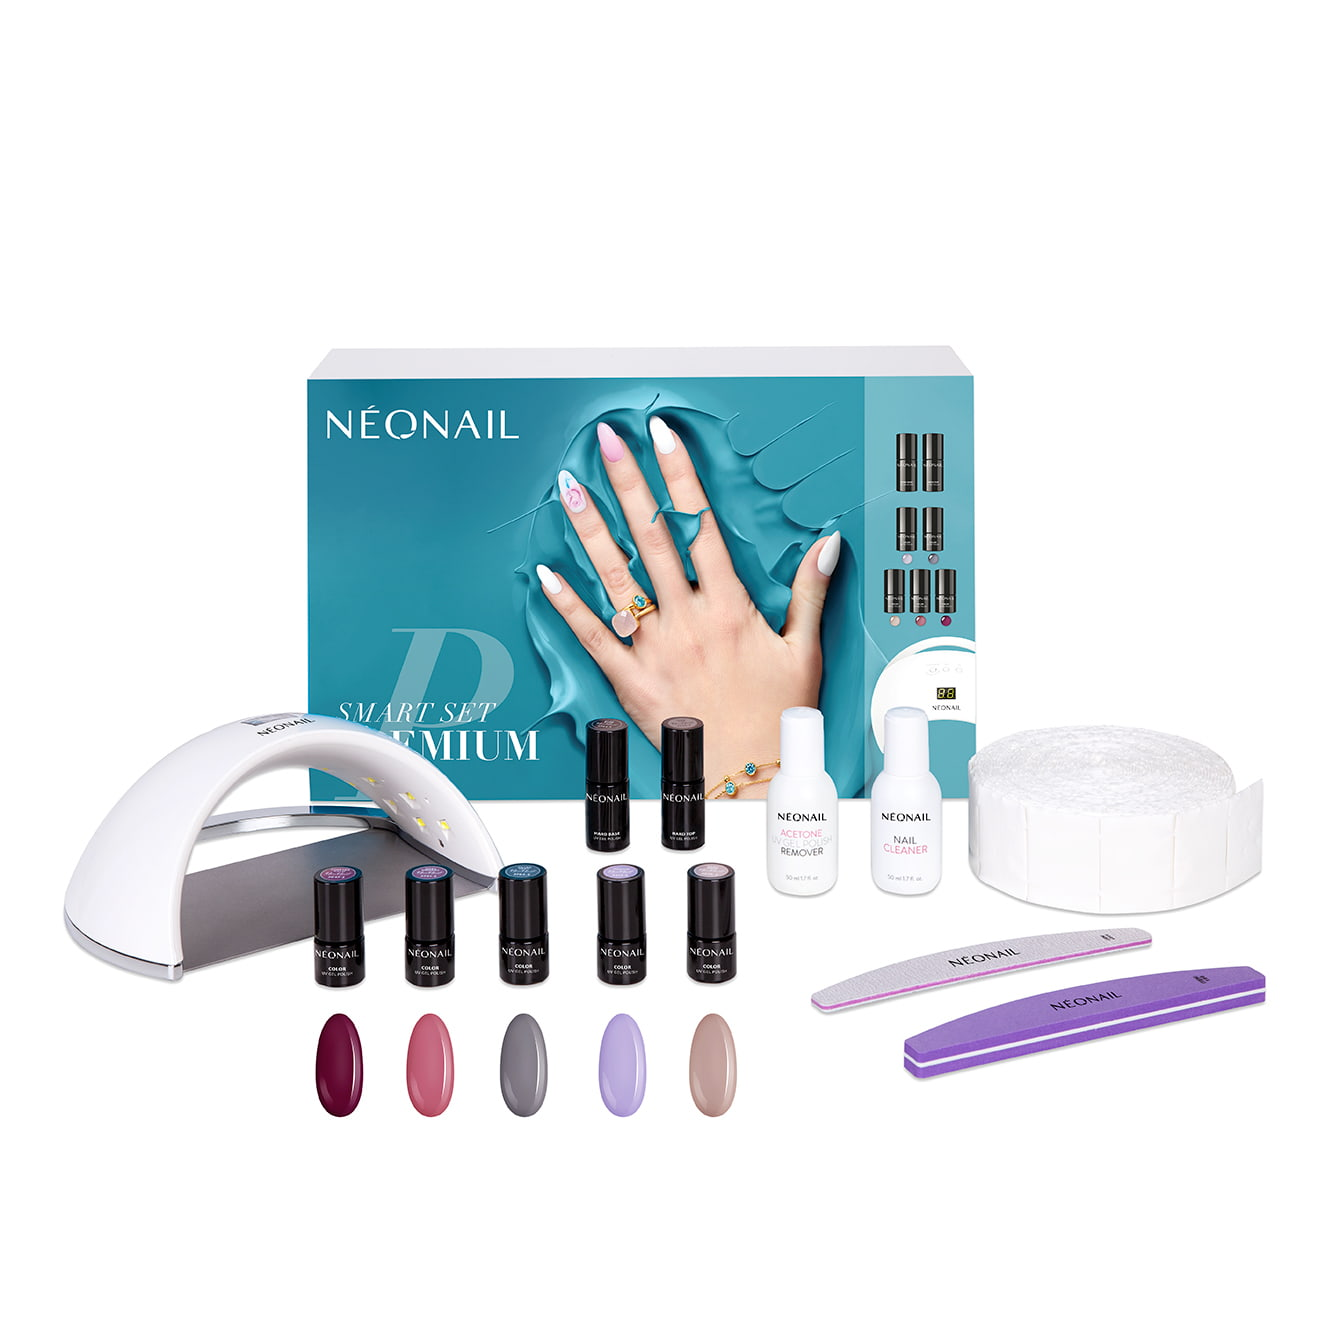 NeoNail Zestaw Smart Set Premium / Zestawy do manicure